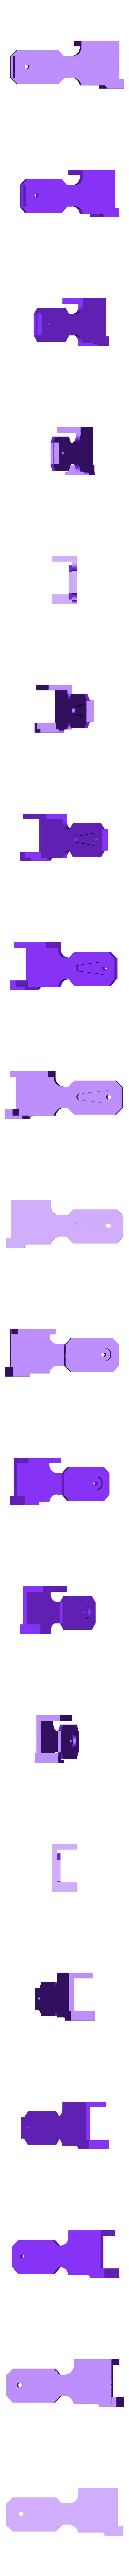 arm.stl Download free STL file 2-Servo Combo Arm • 3D print template, indigo4